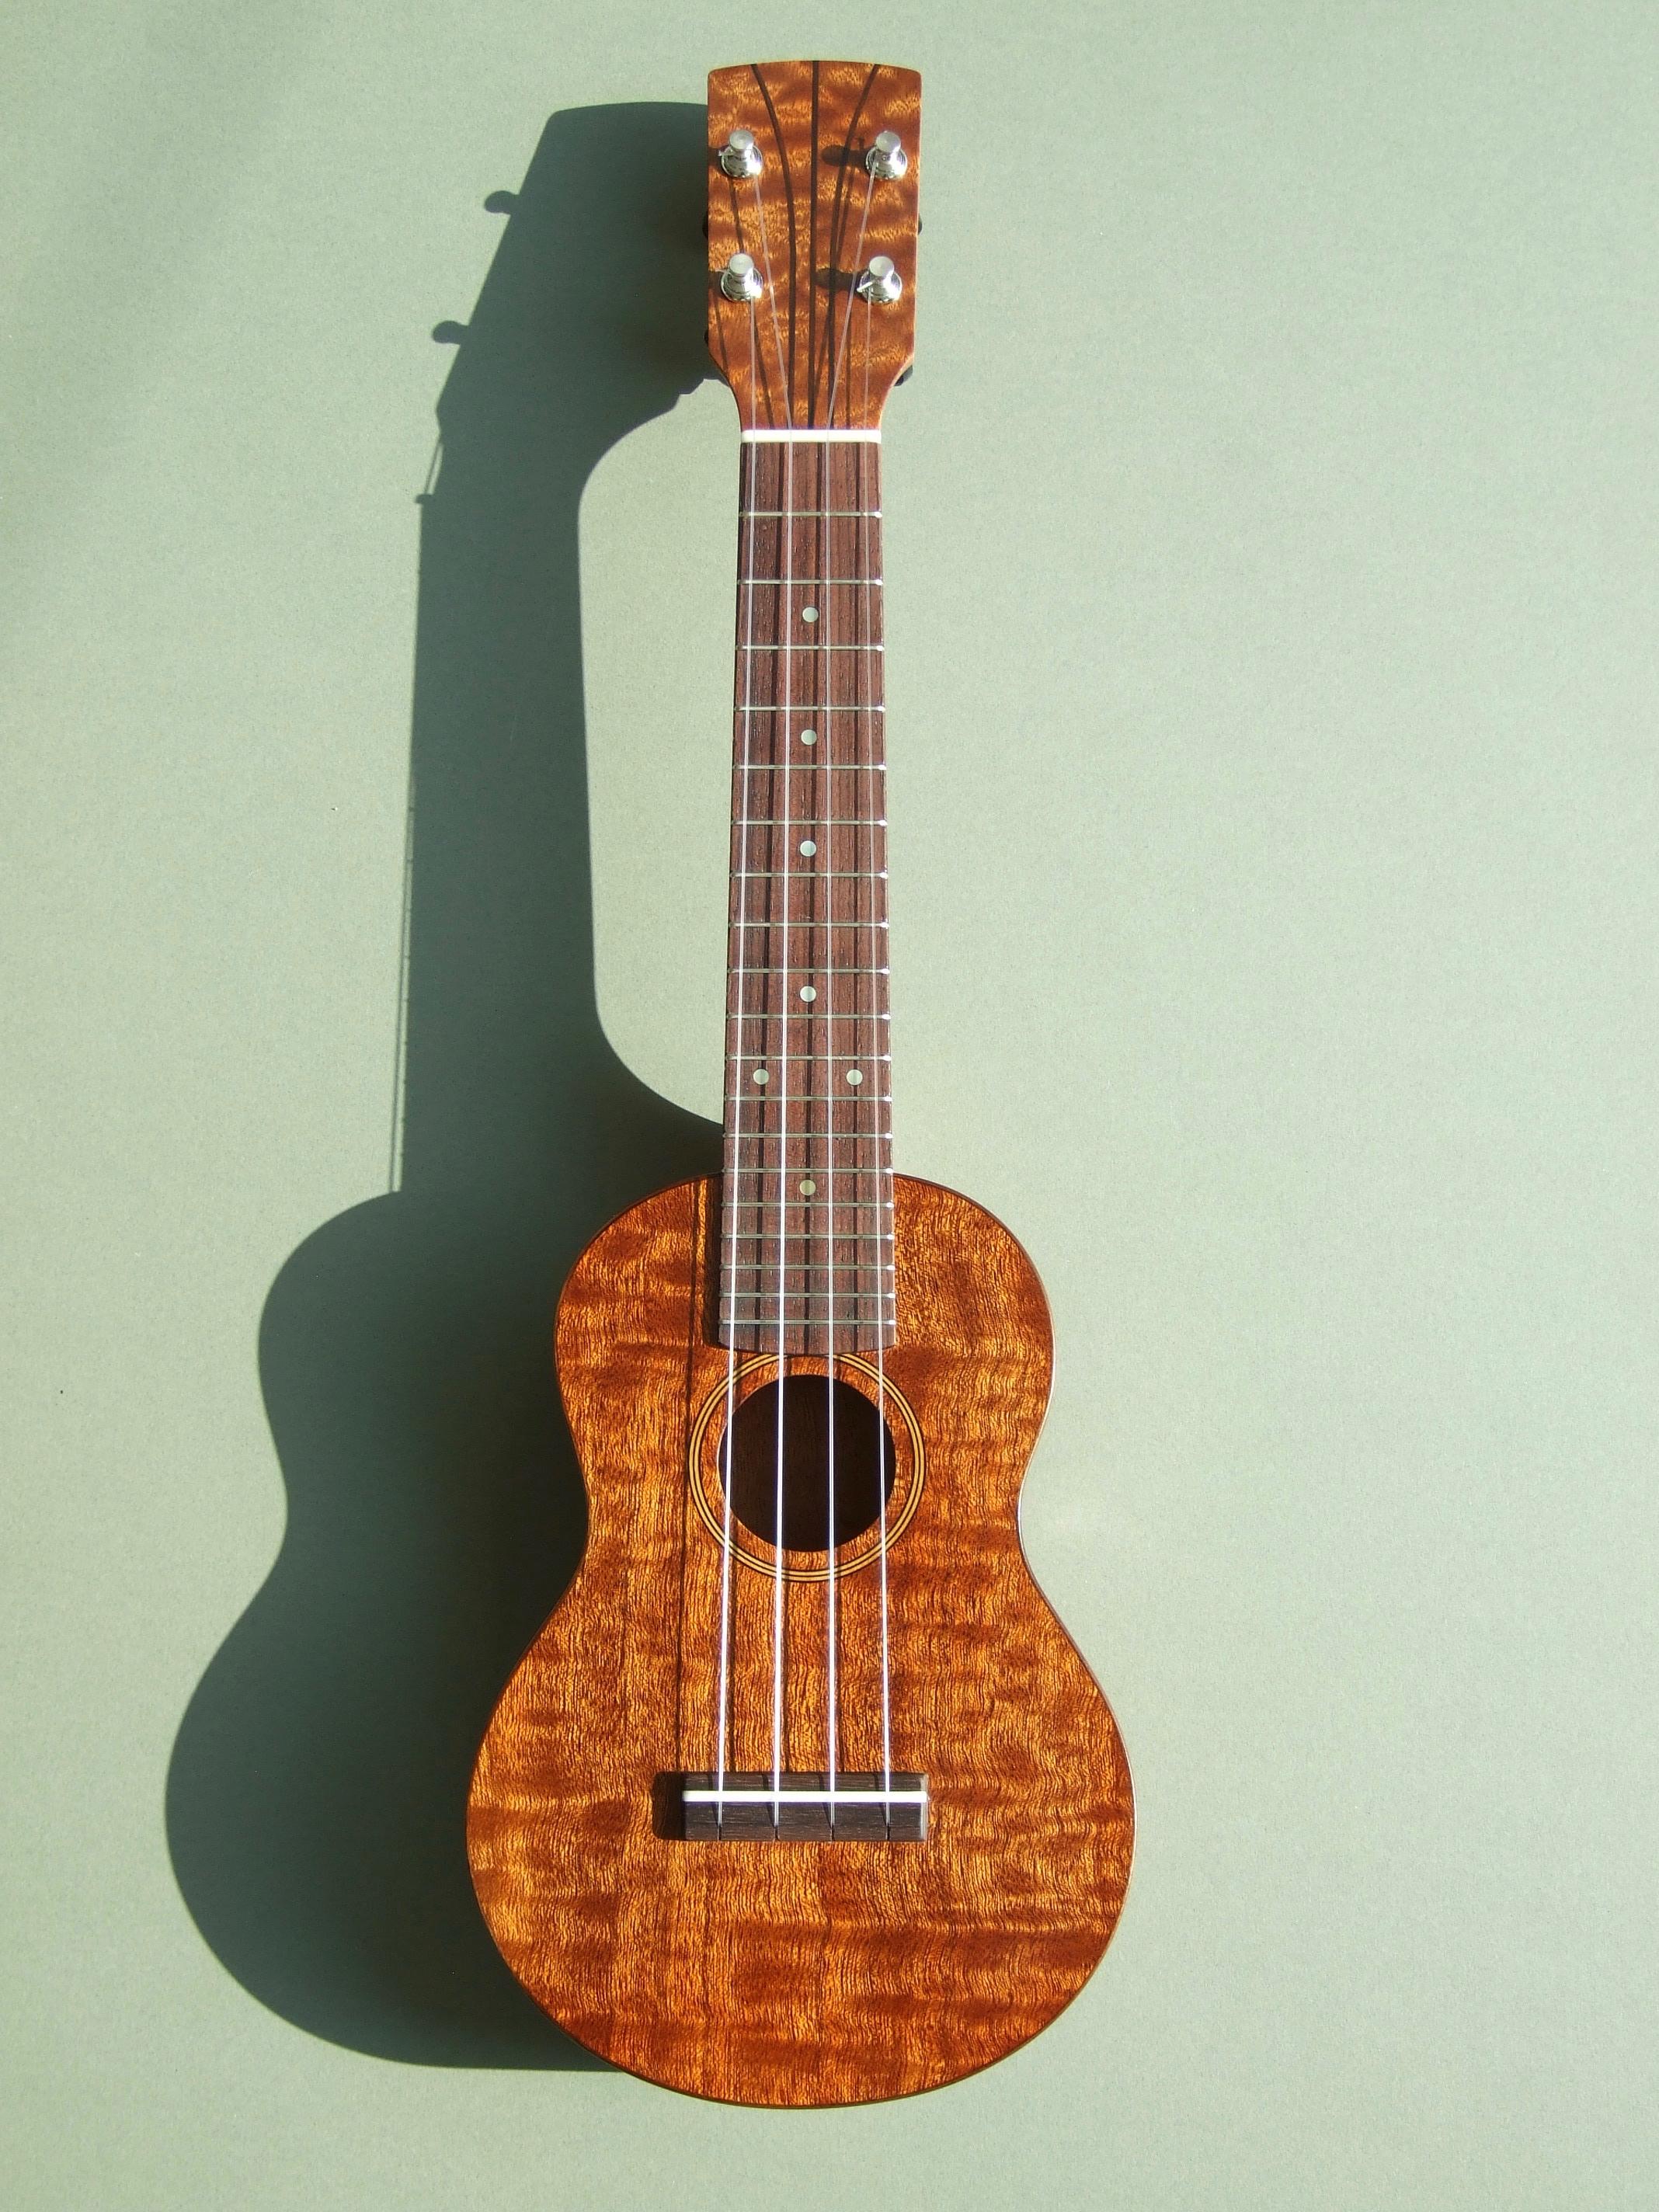 dj morgan soprano ukulele in figured mahogany. Black Bedroom Furniture Sets. Home Design Ideas